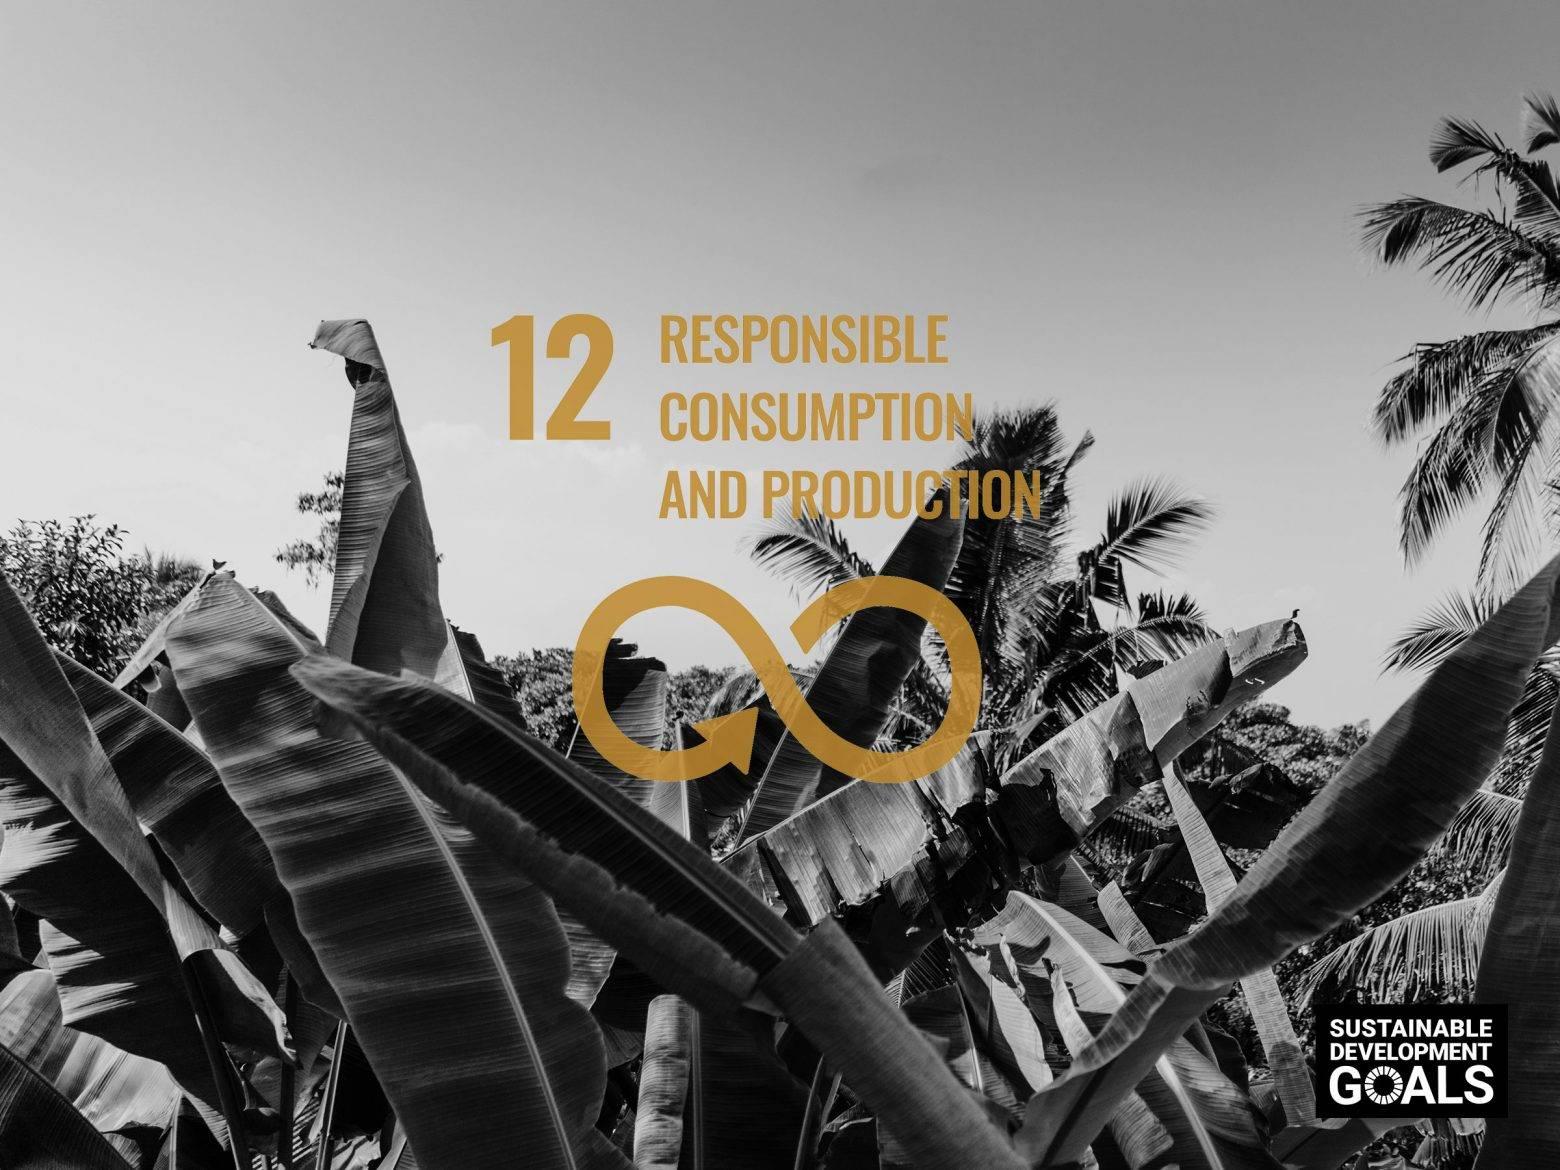 https://www.soulandsurf.com/wp-content/uploads/2021/08/our-sustainable-ish-plan-S_S-UNSDG-Responsible-Consumption-e1628601775884.jpg Image